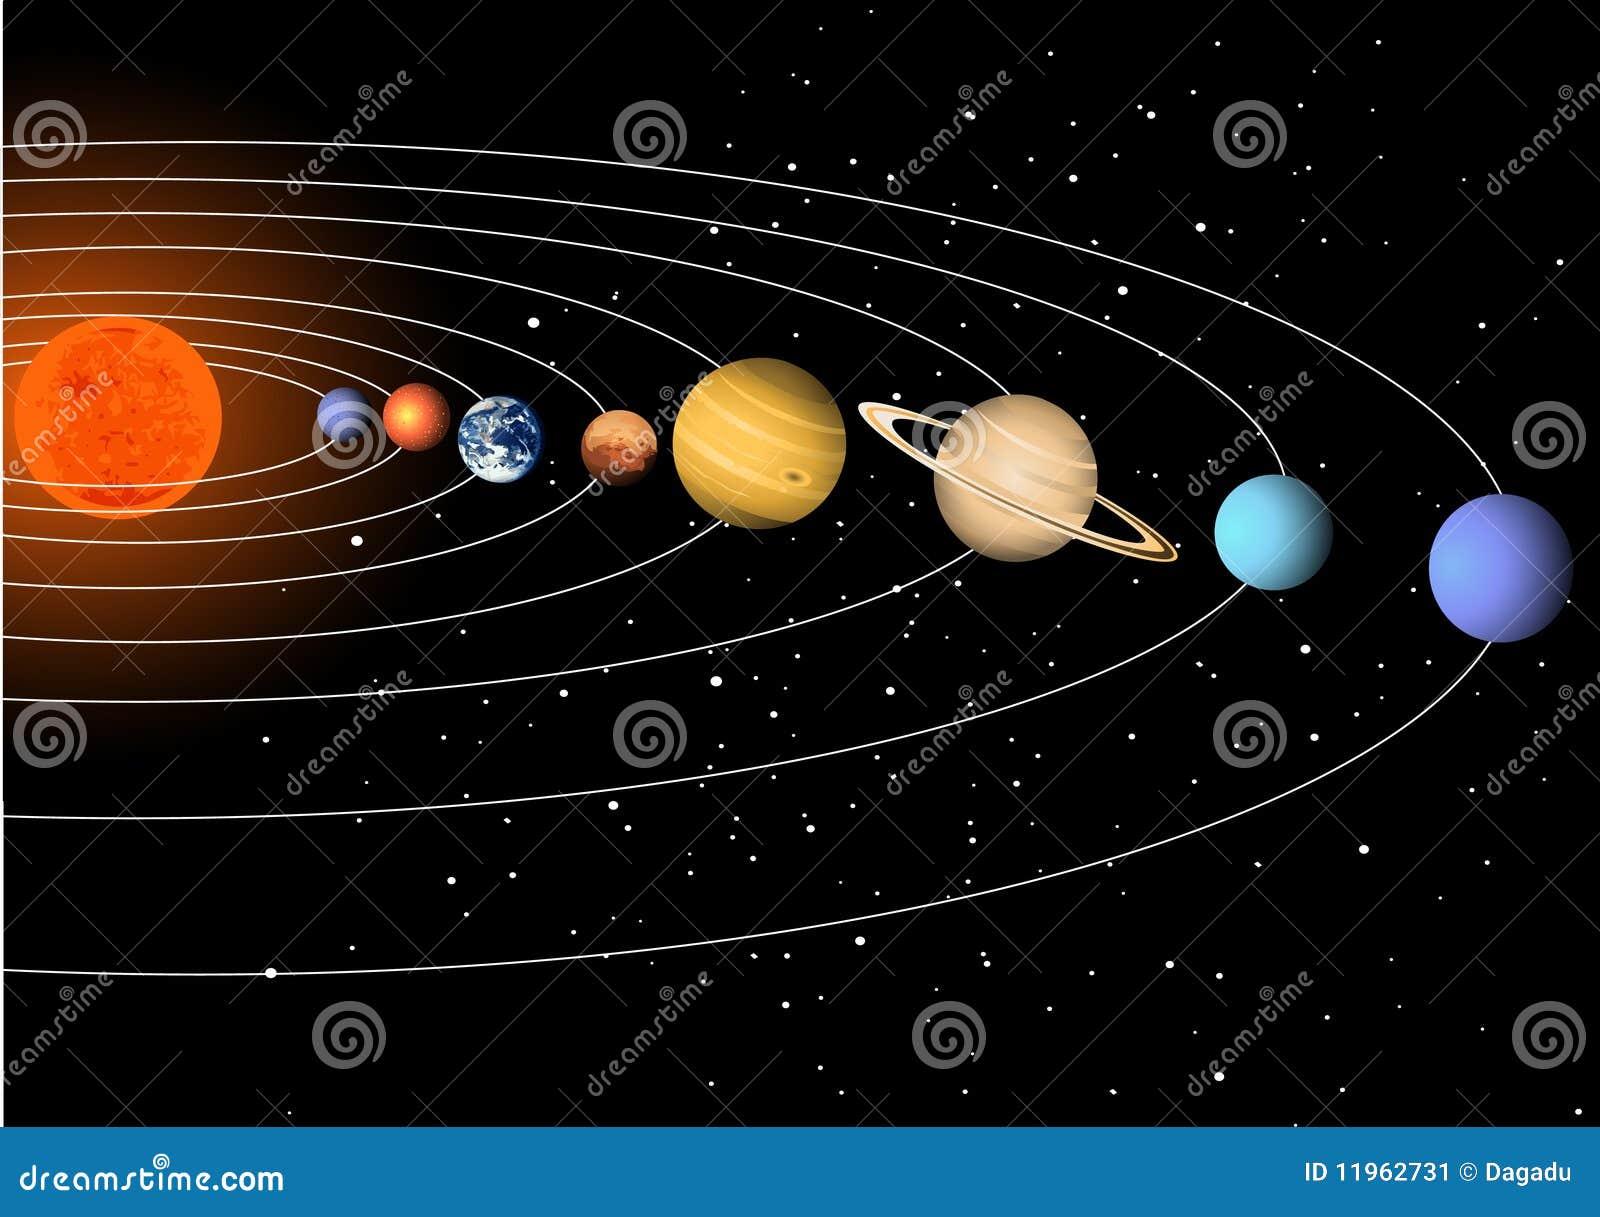 stock image  solar system  image  11962731